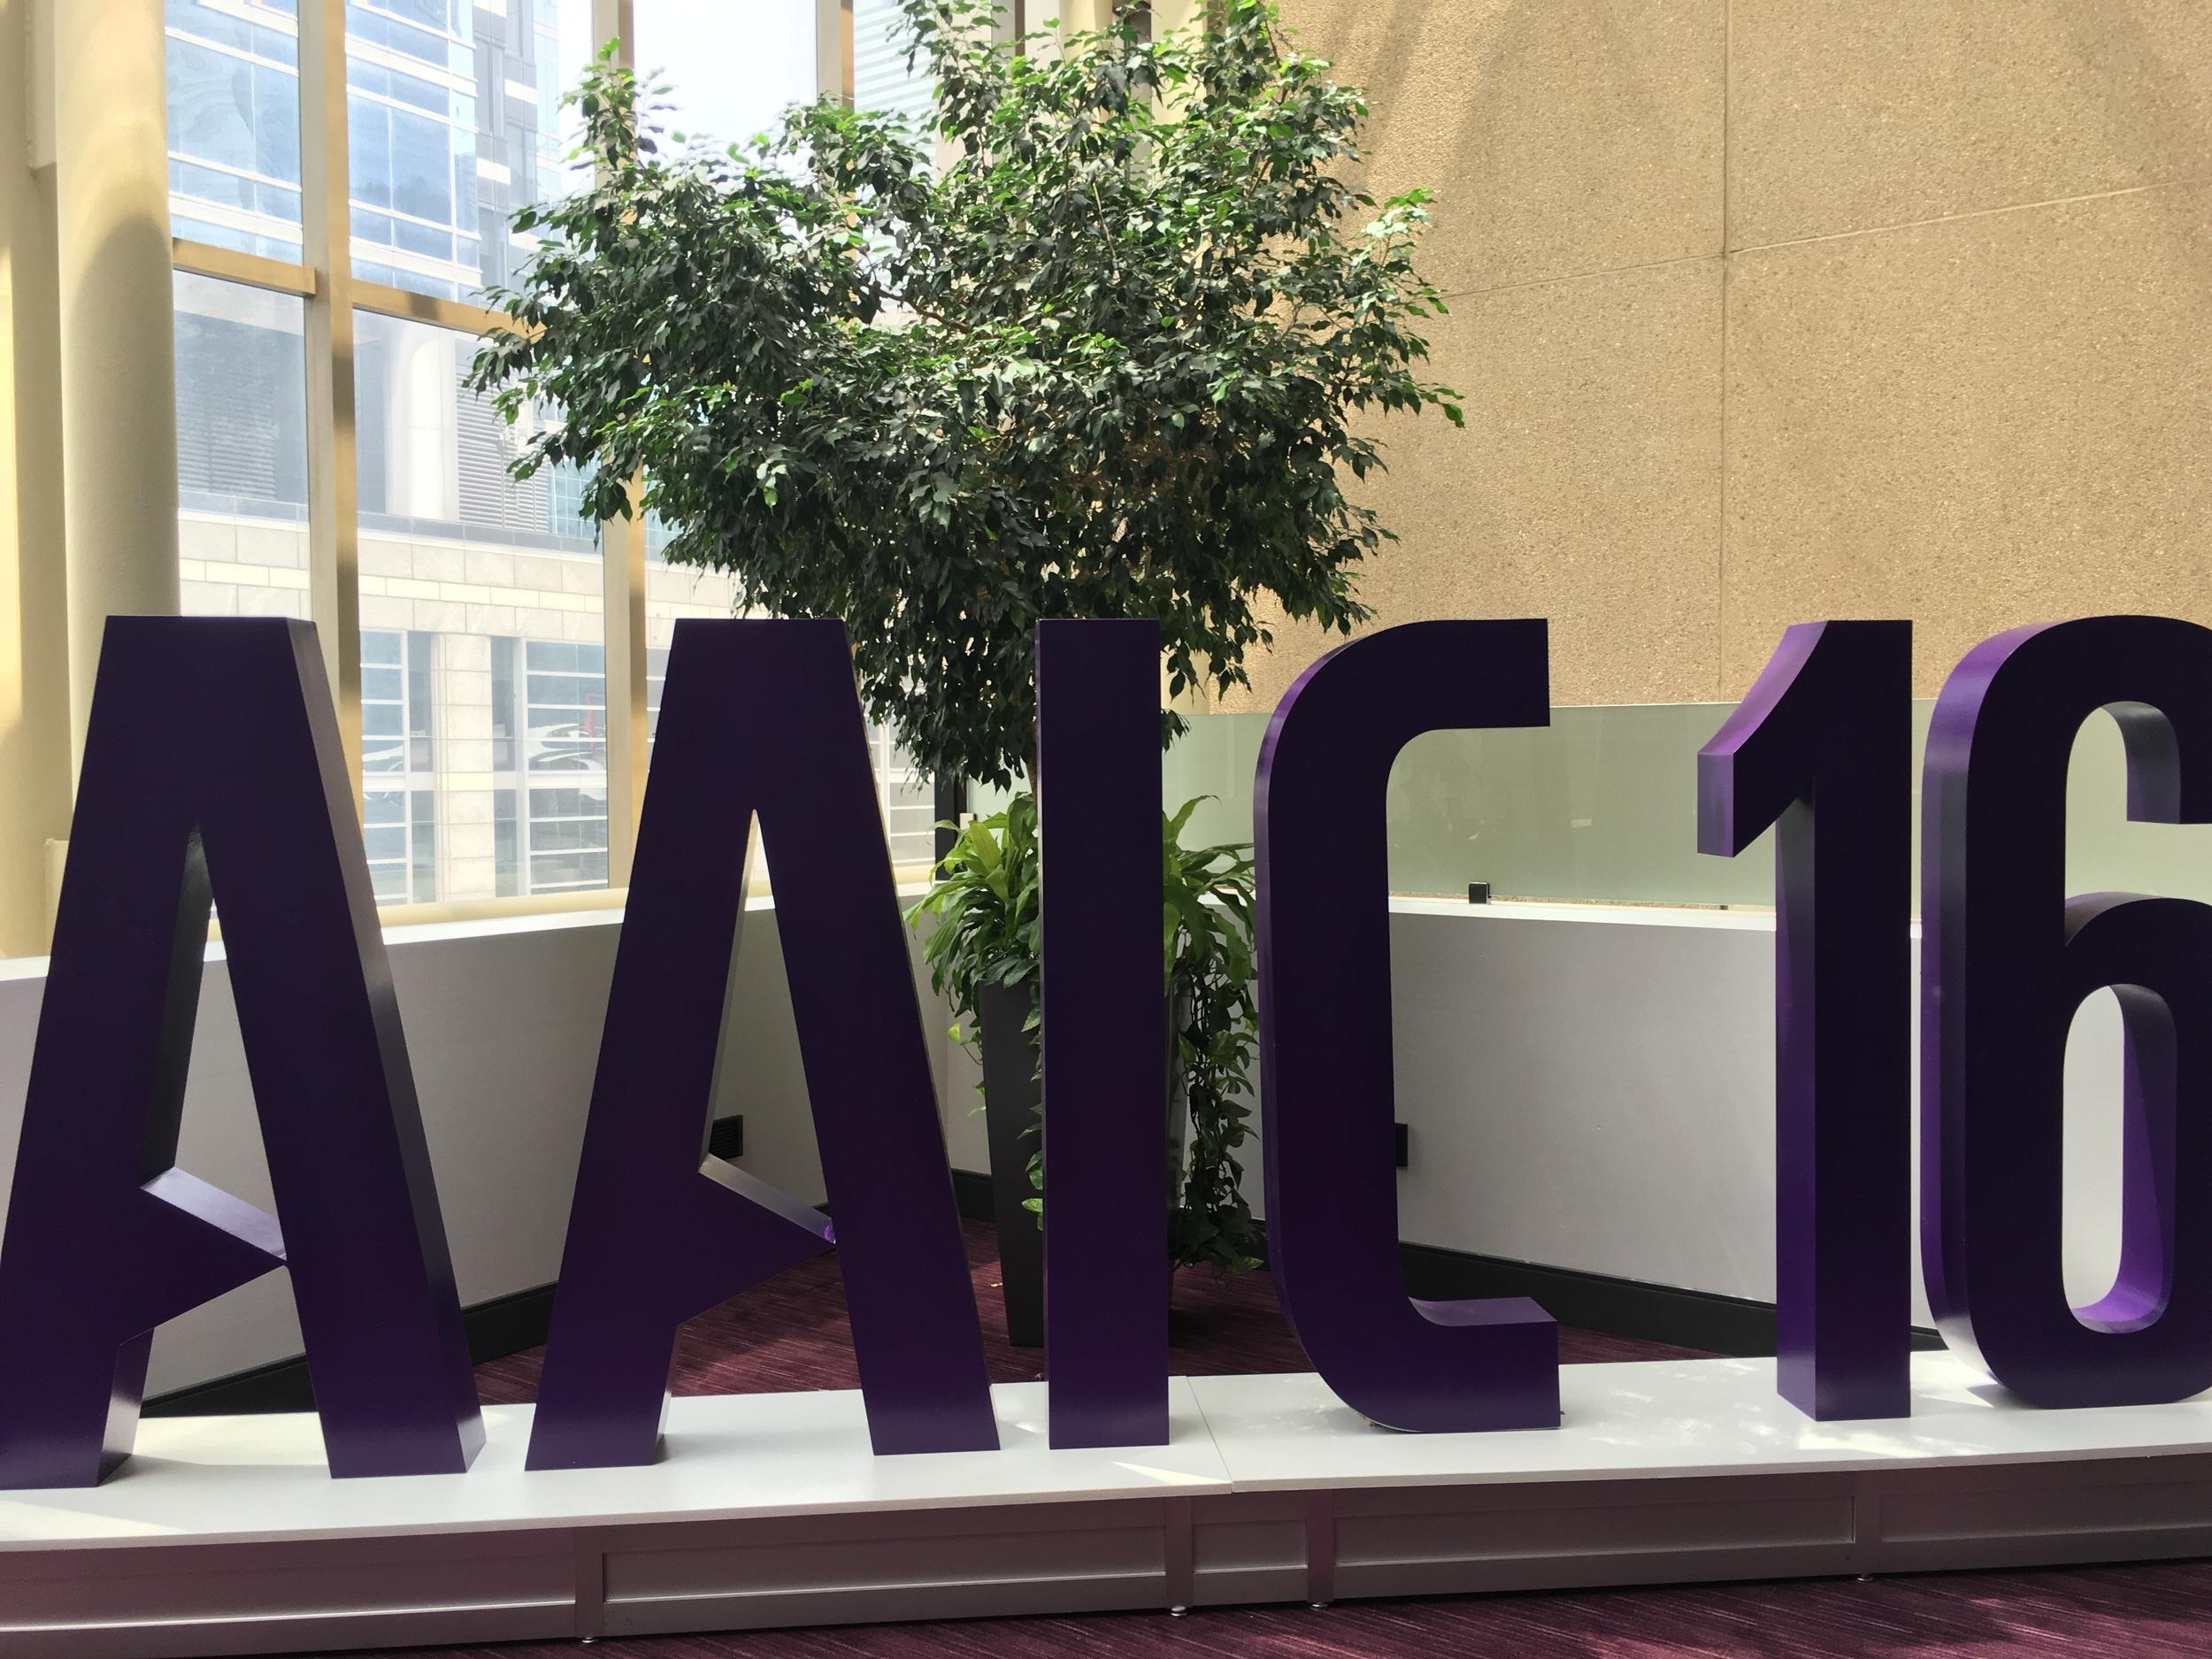 AcTo Dementia at AAIC 2016, Toronto